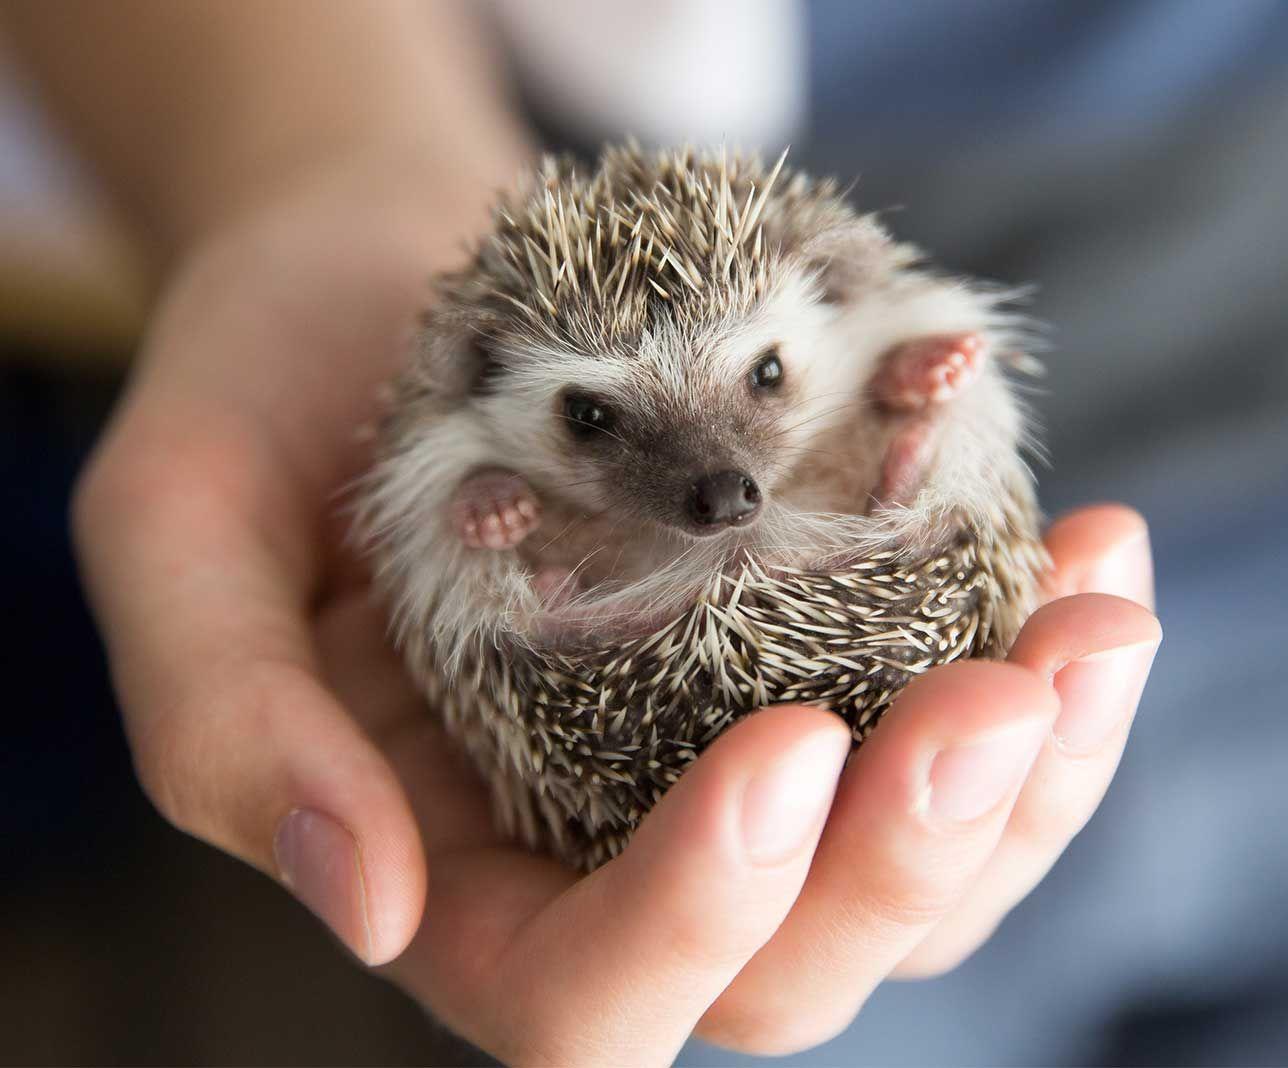 Vet holding a pocket pet